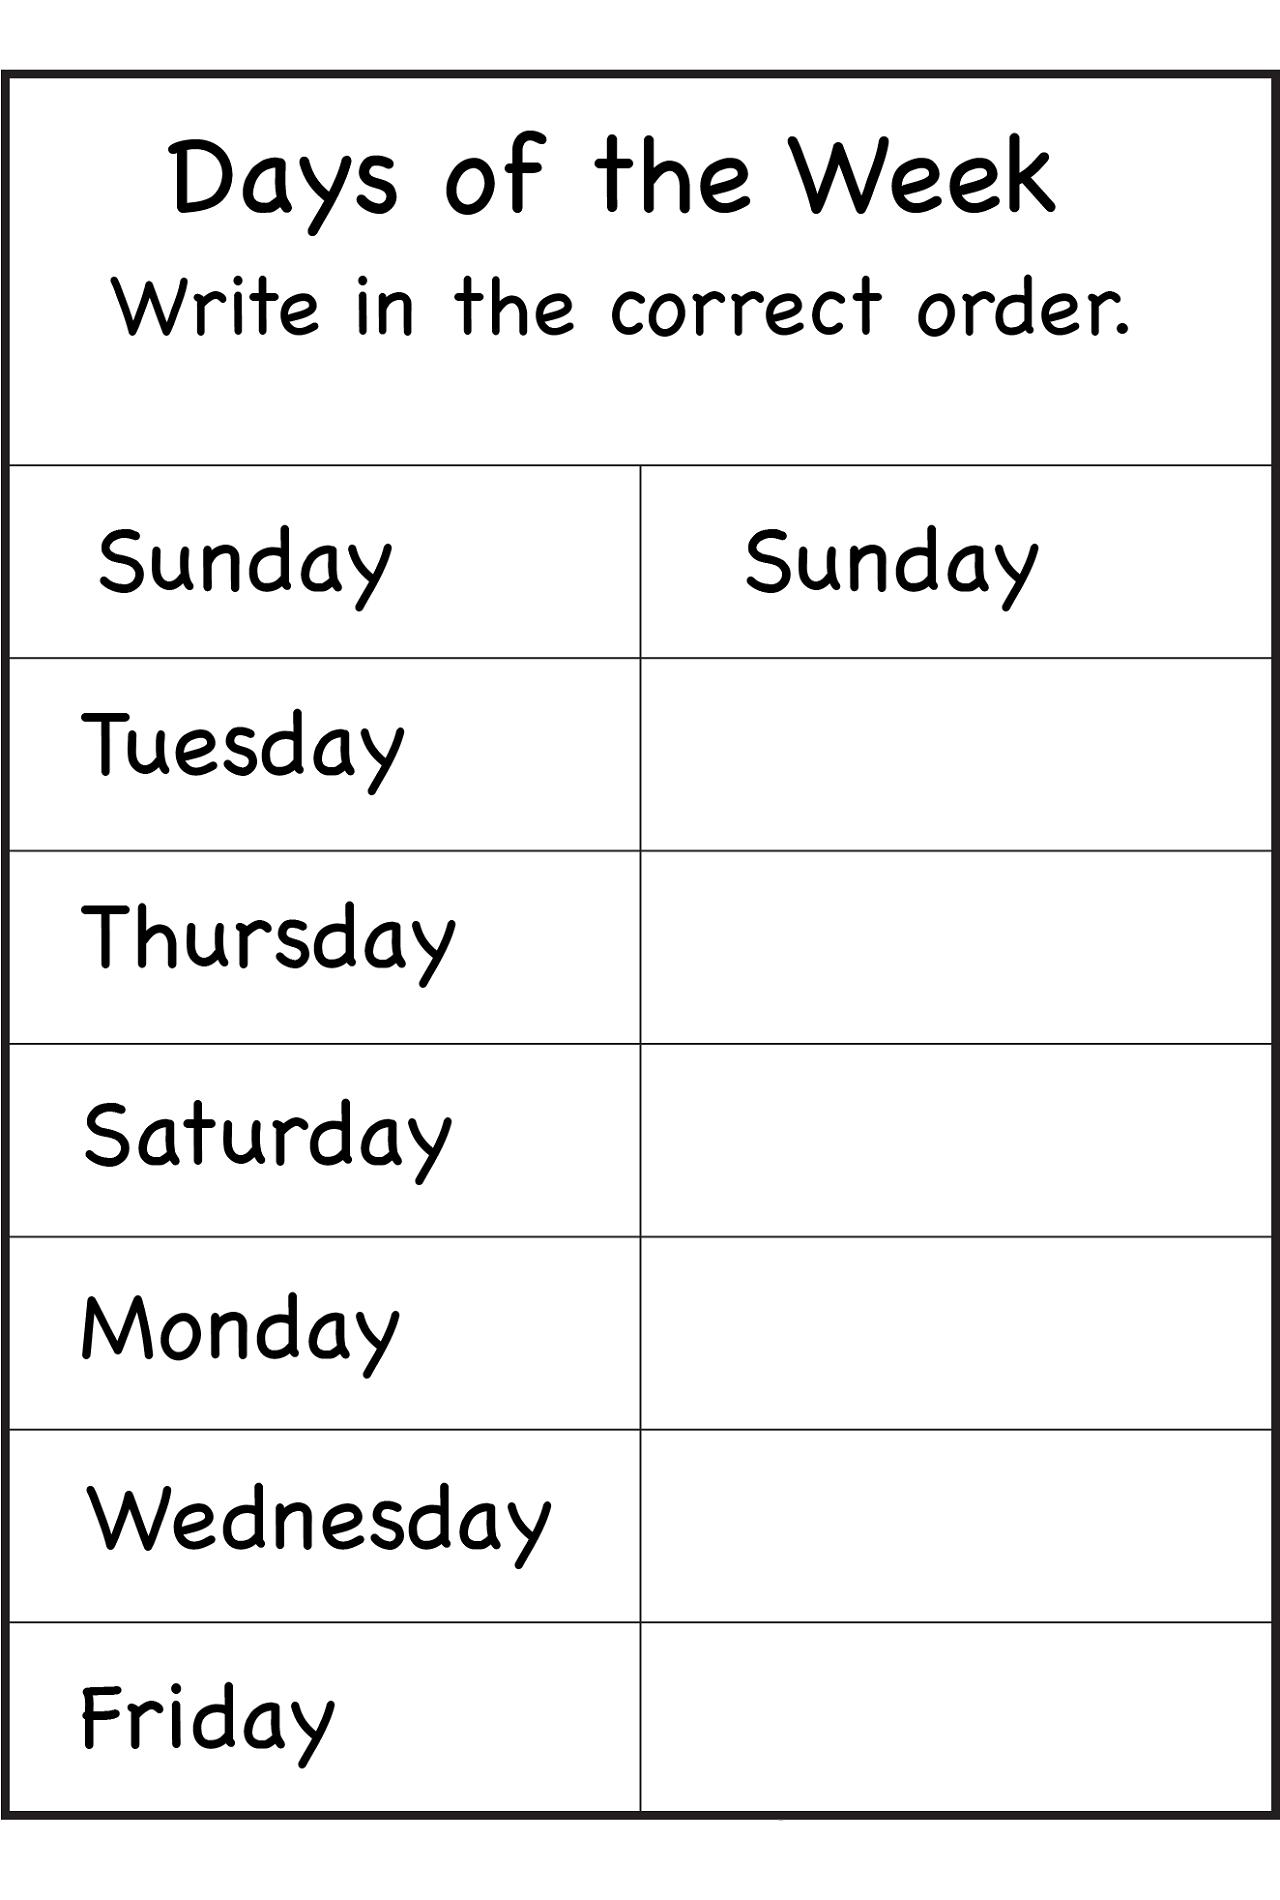 free days of the week worksheet order | Homework | Pinterest